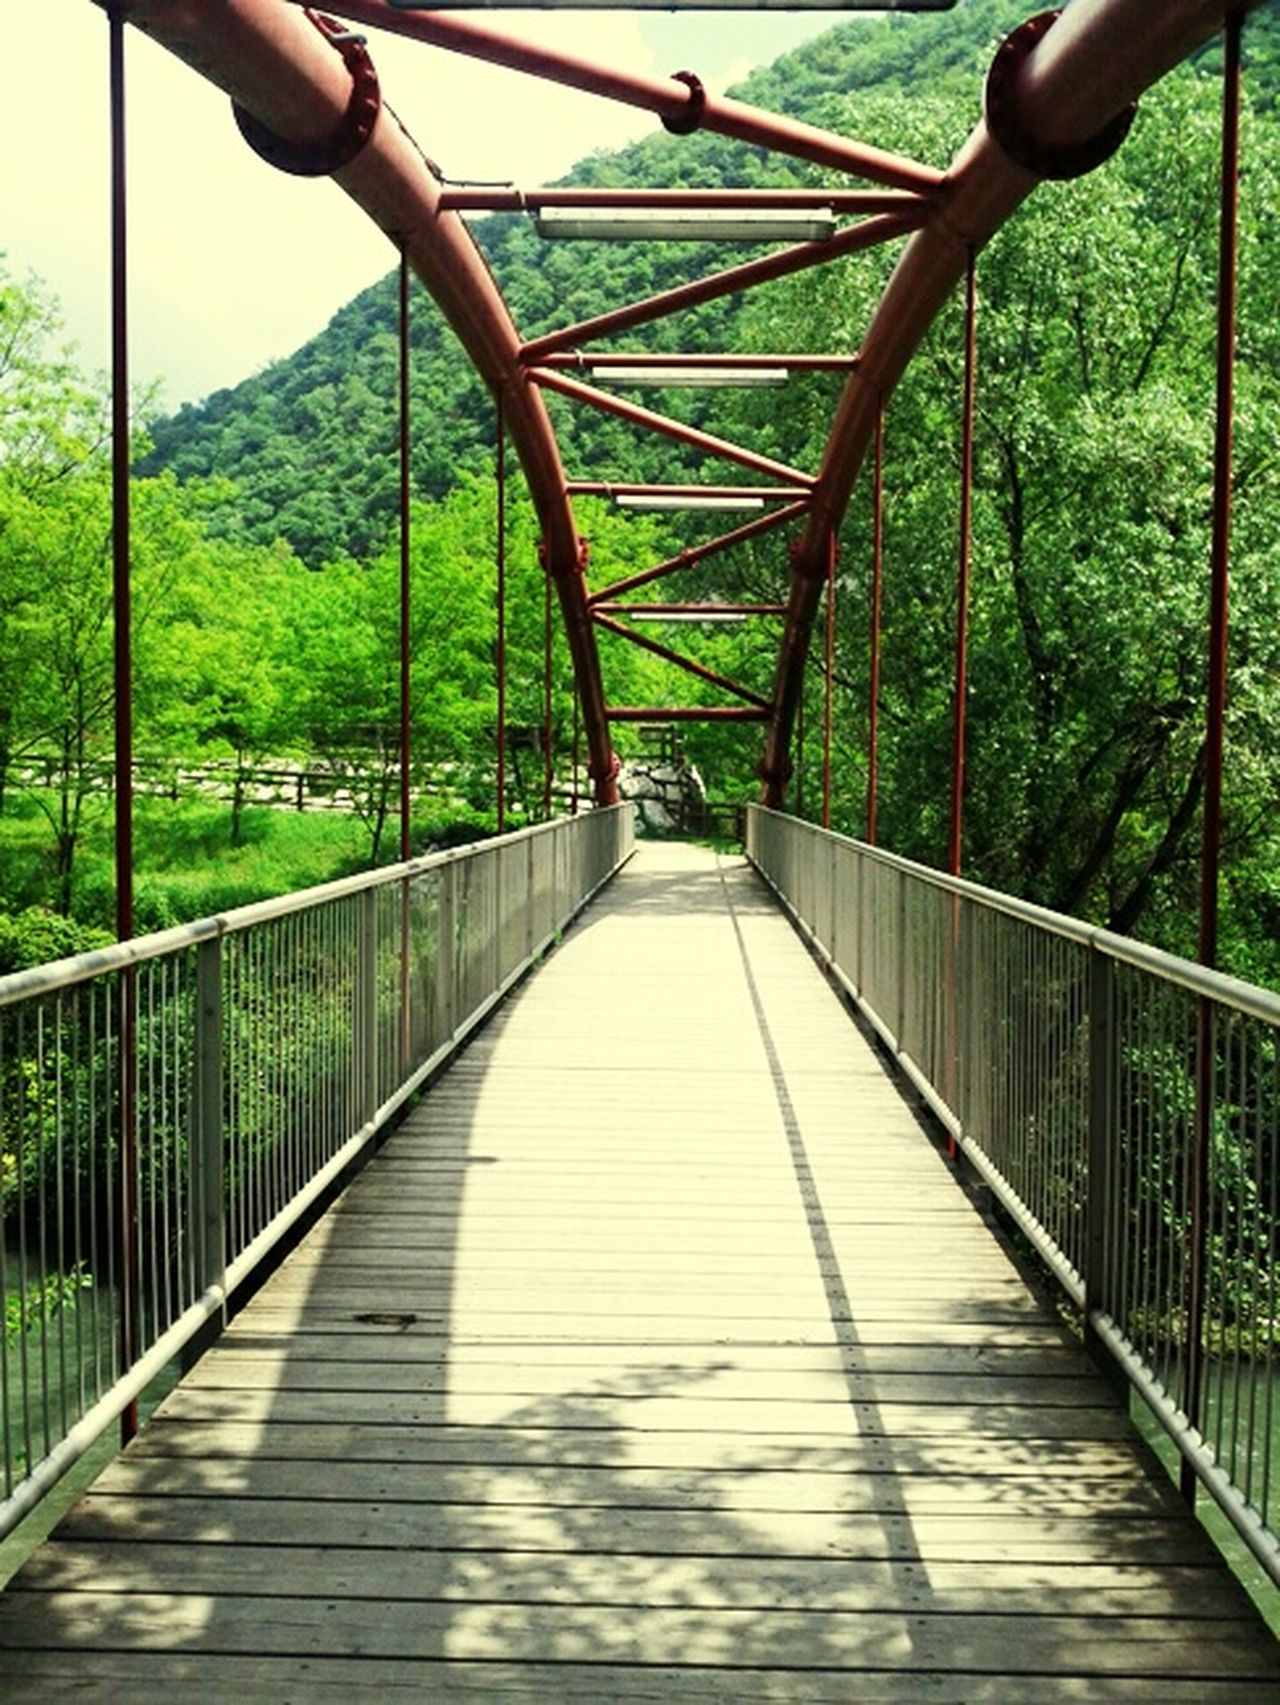 The Adventure Handbook Bridging On The Path Running Bridges Never Give Up Straightforward EyeEm Nature Lover